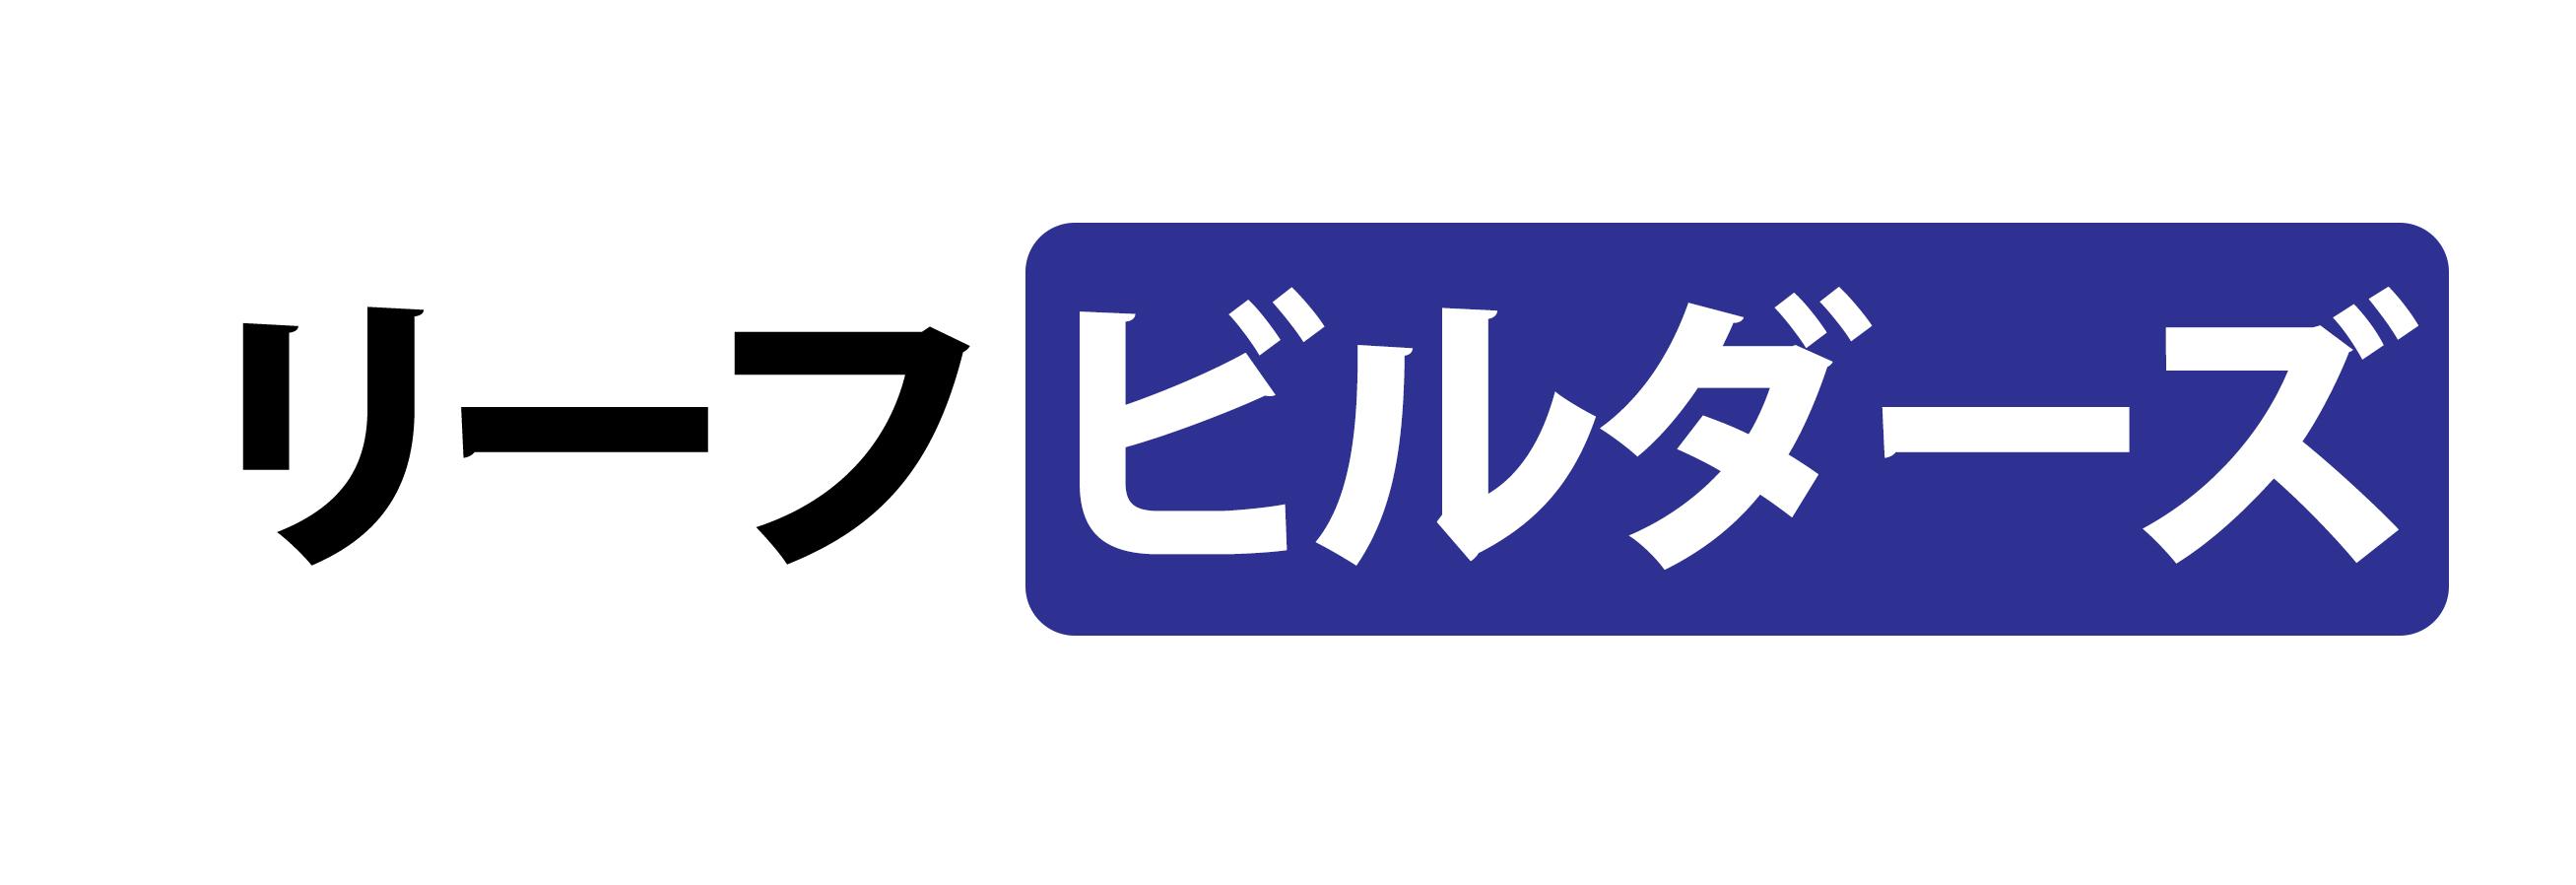 reefbuilders_logo